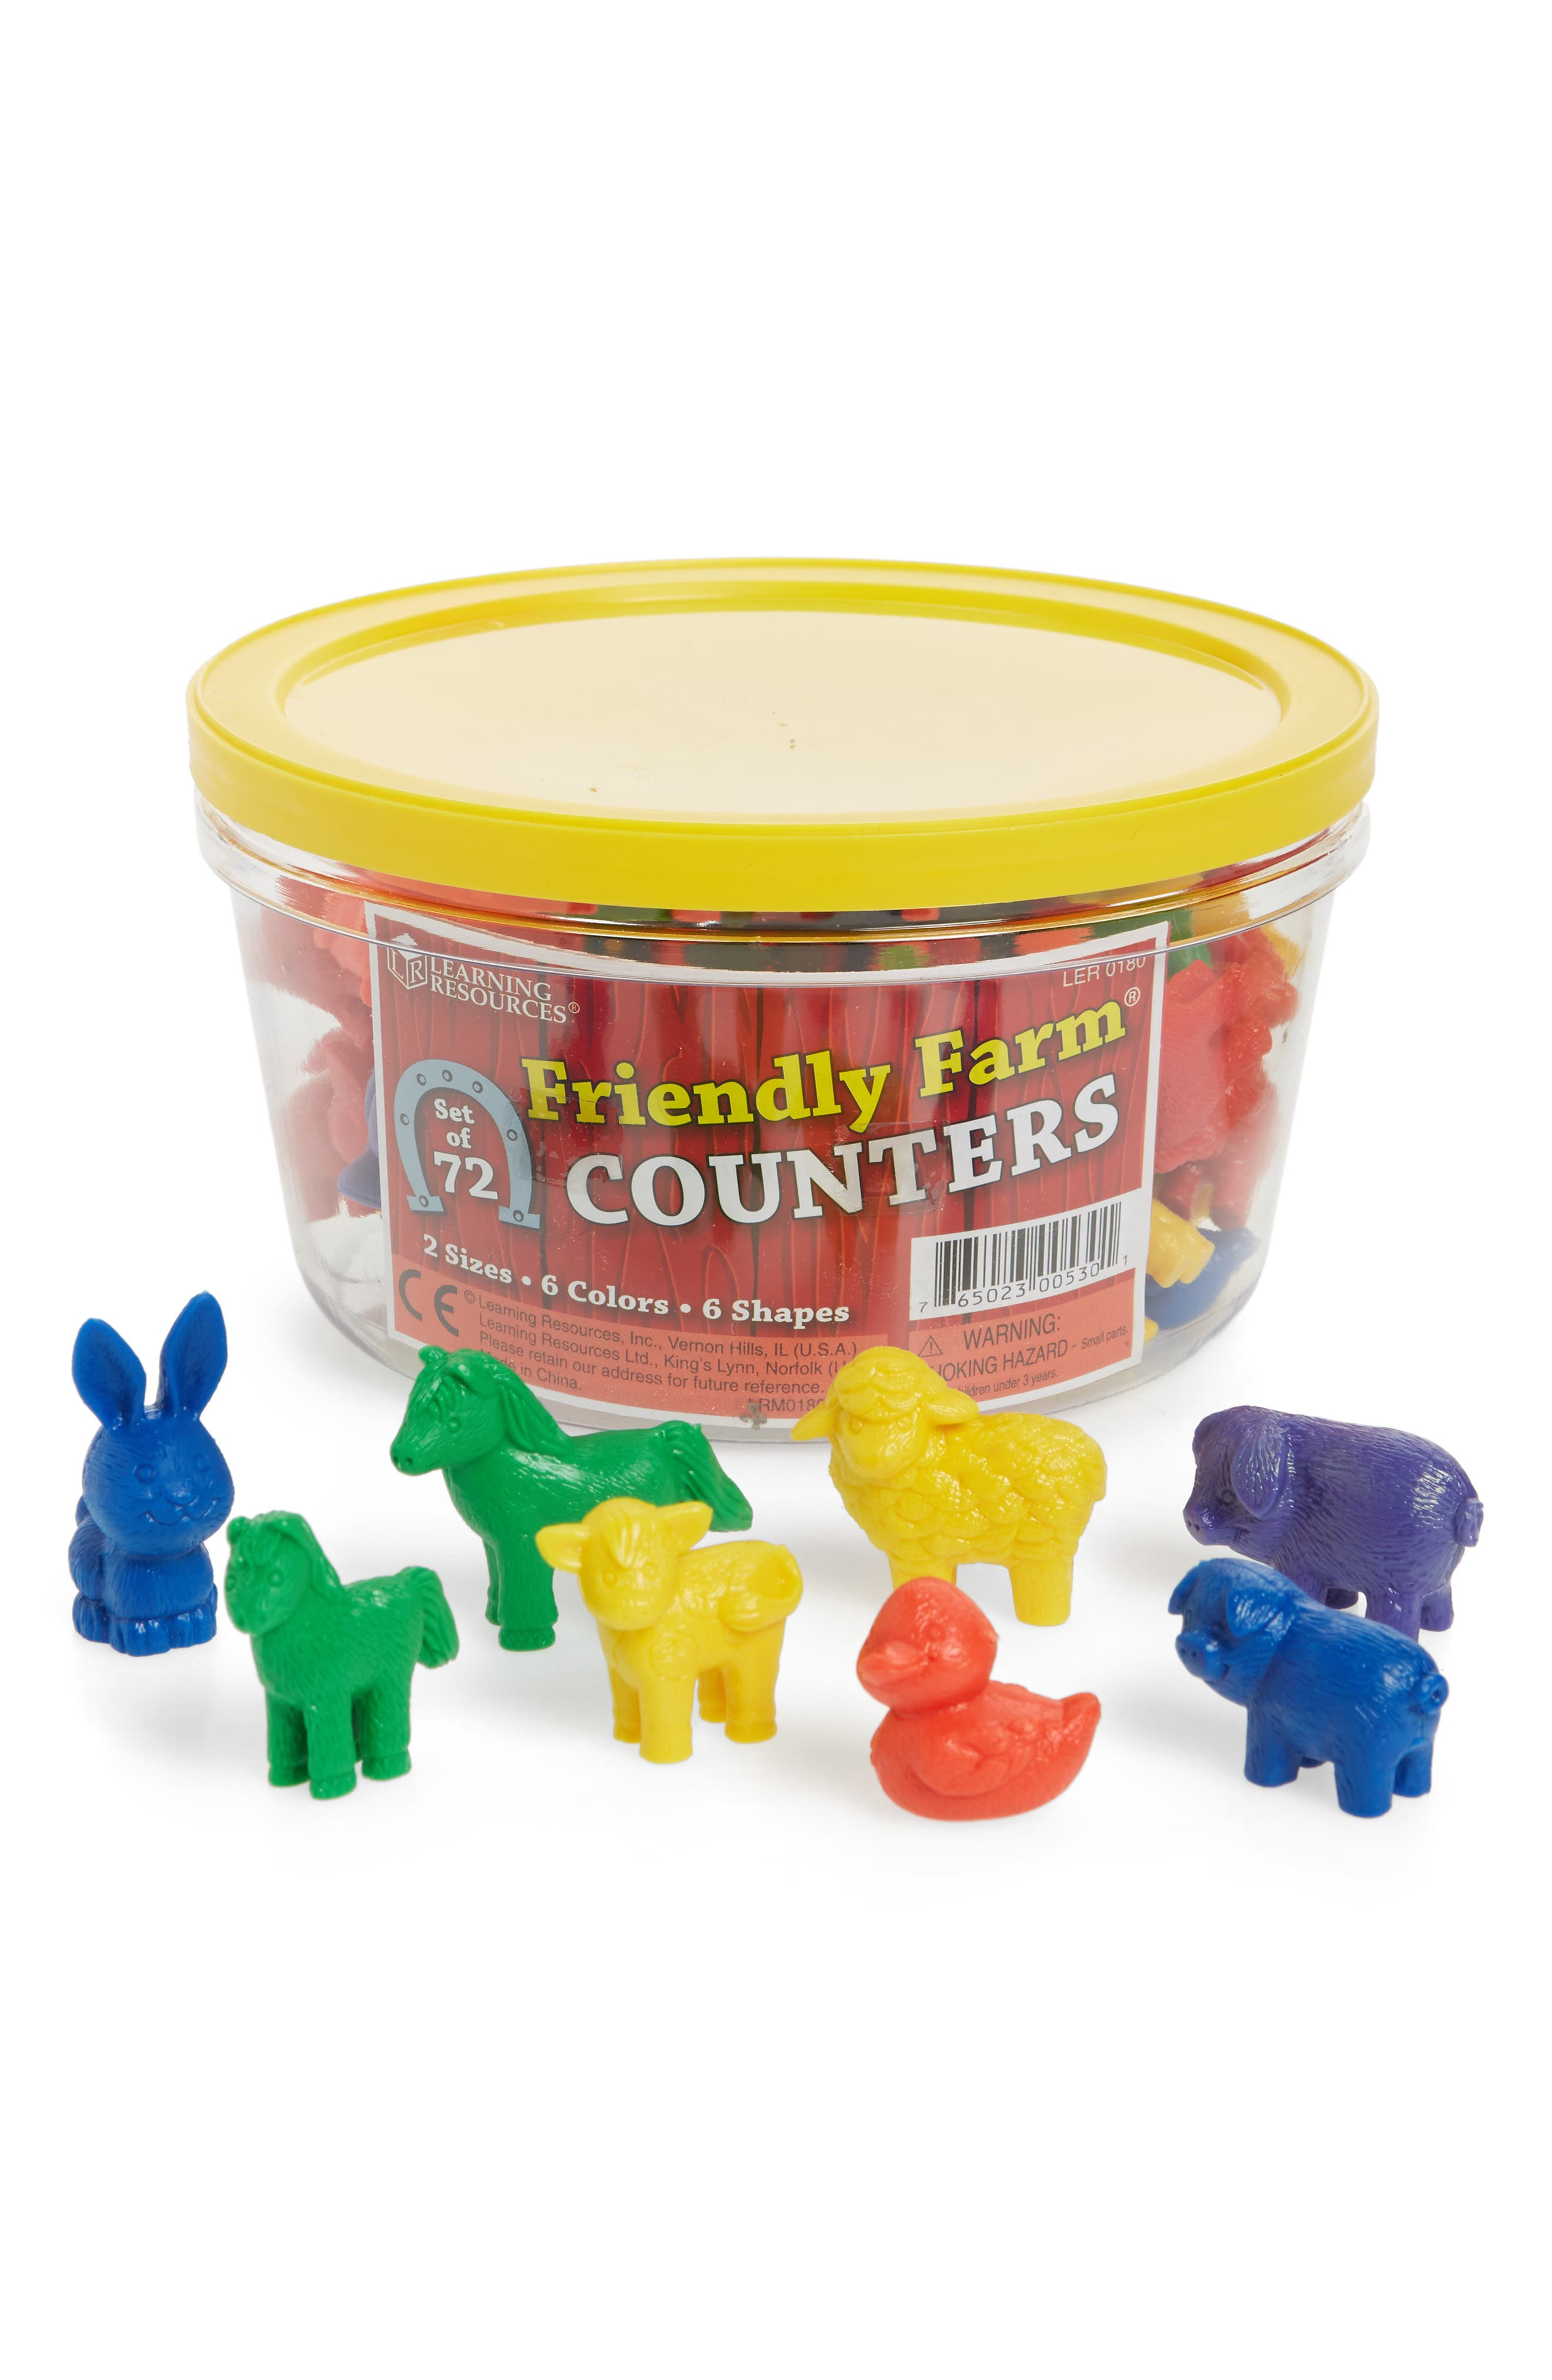 72-Piece Friendly Farm Counters Play Set,                         Main,                         color, 700